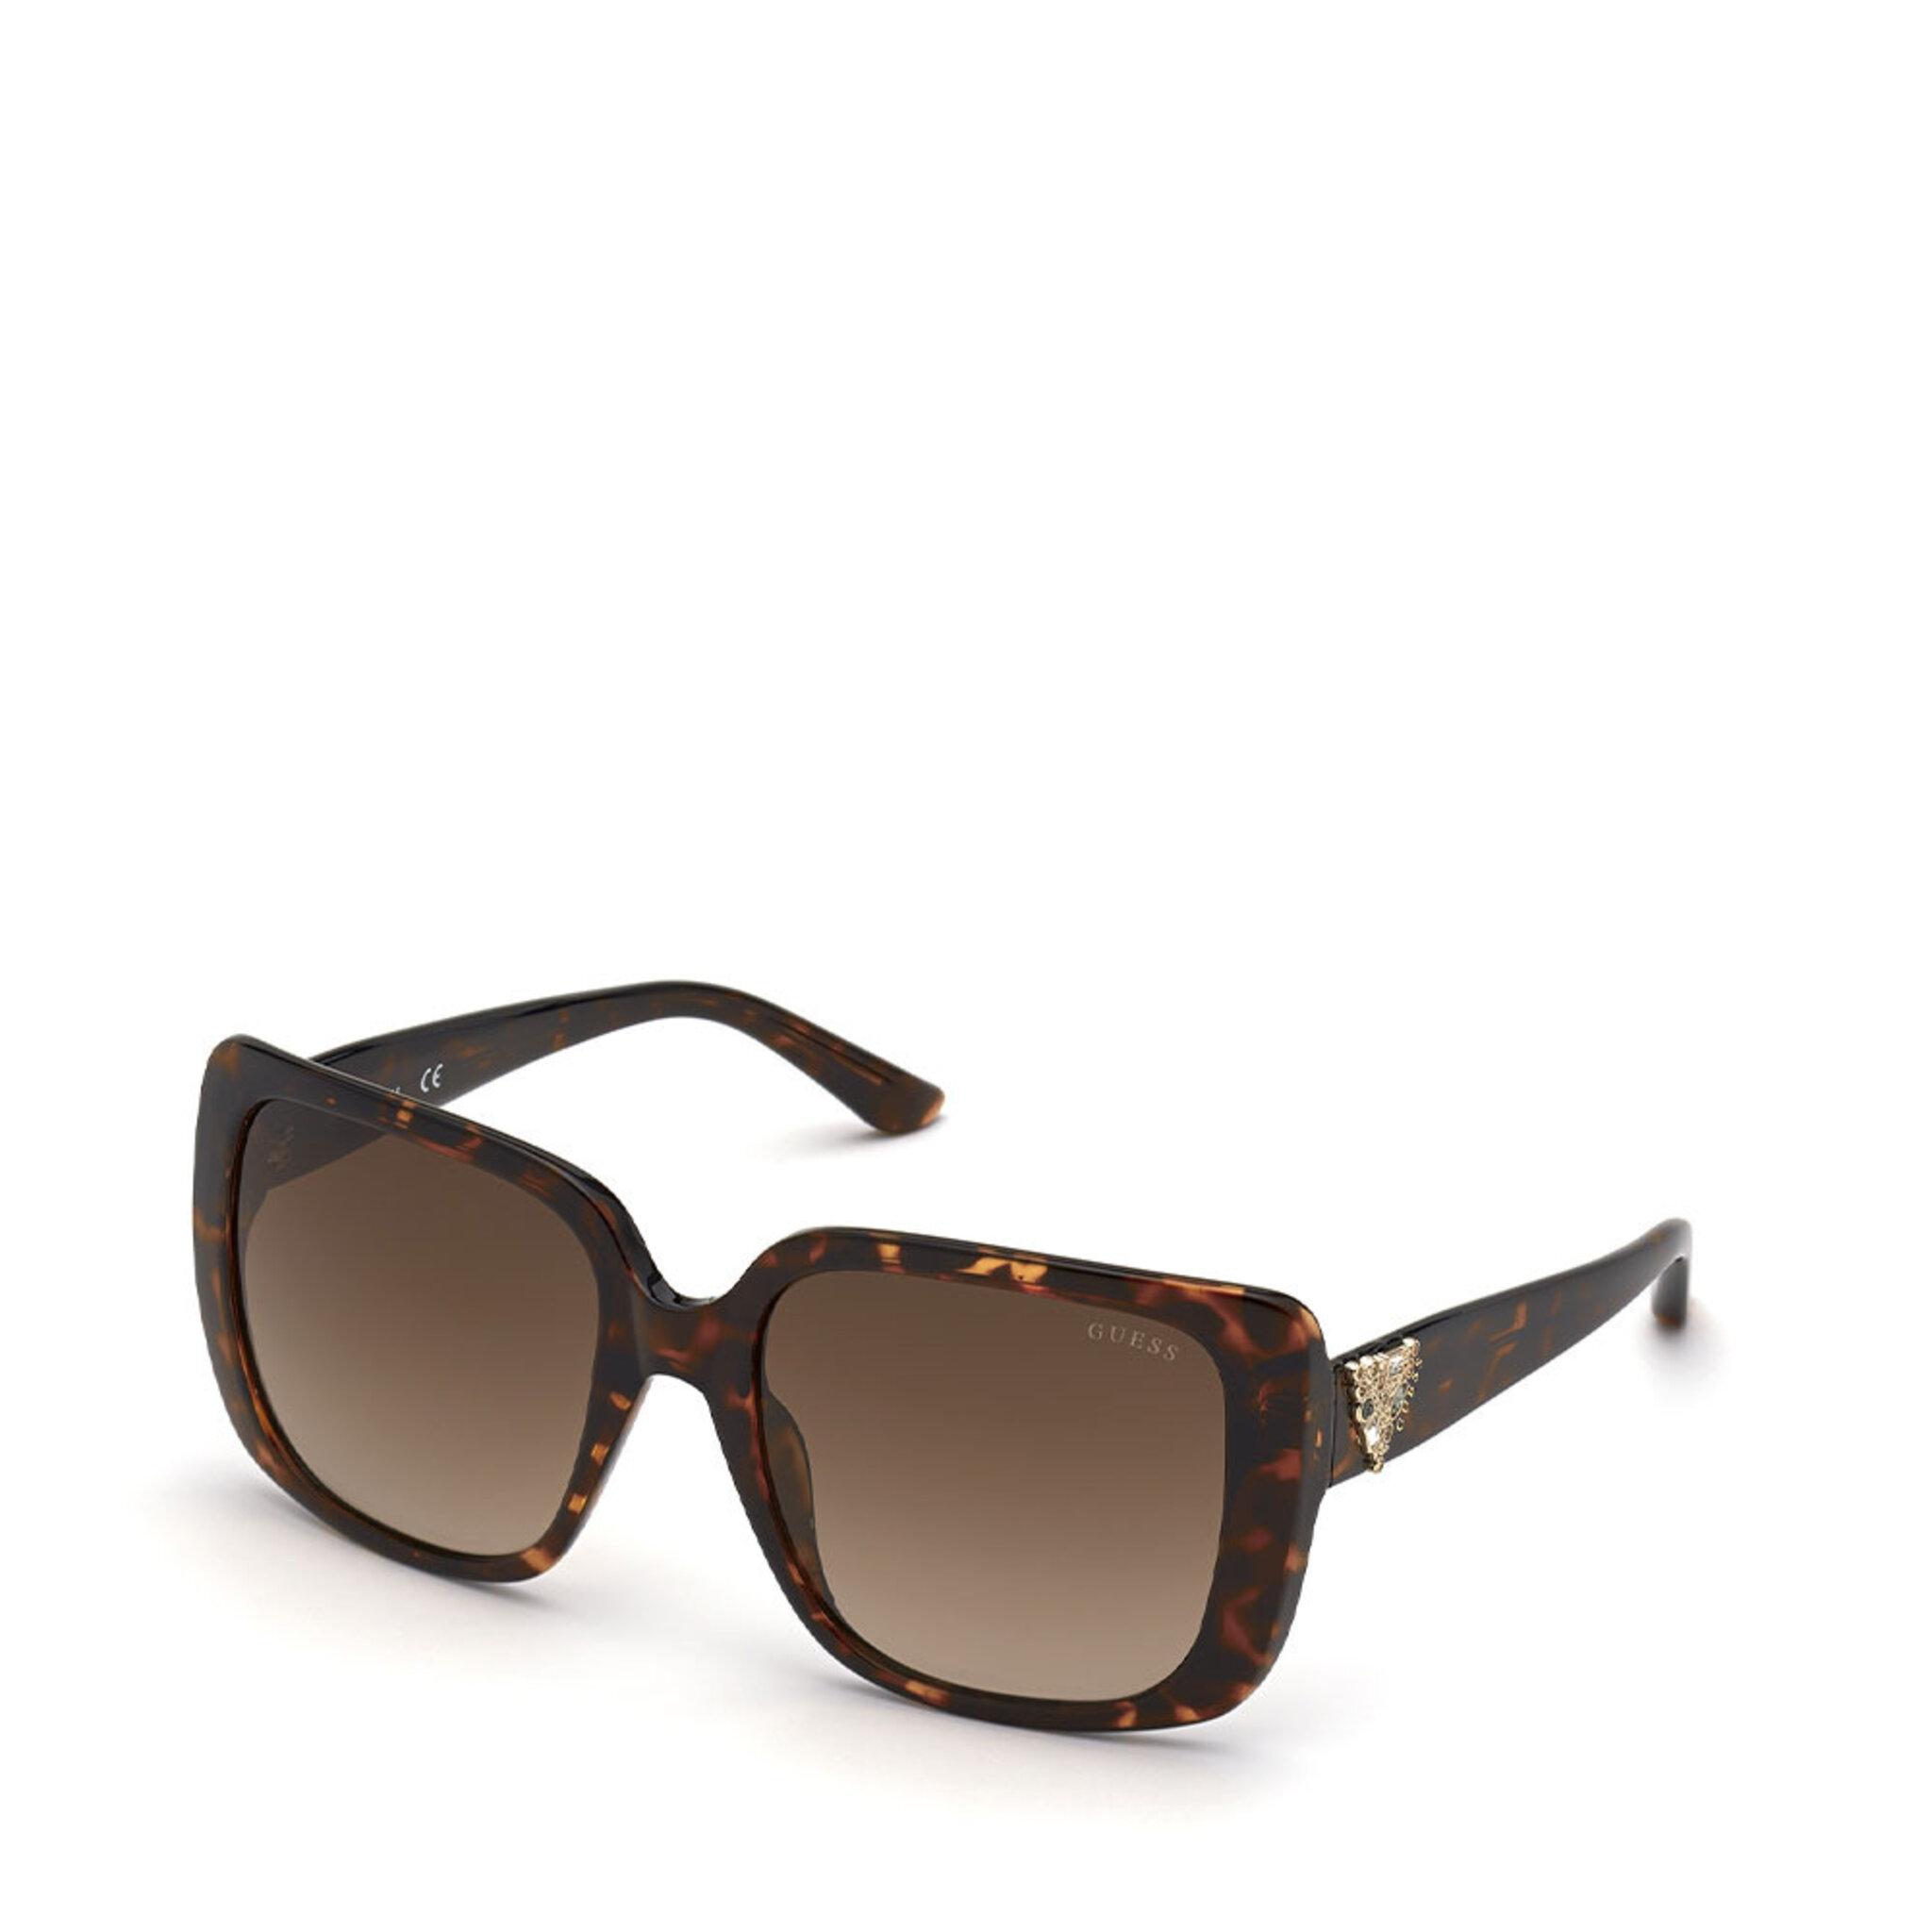 Sunglasses GU7788-S